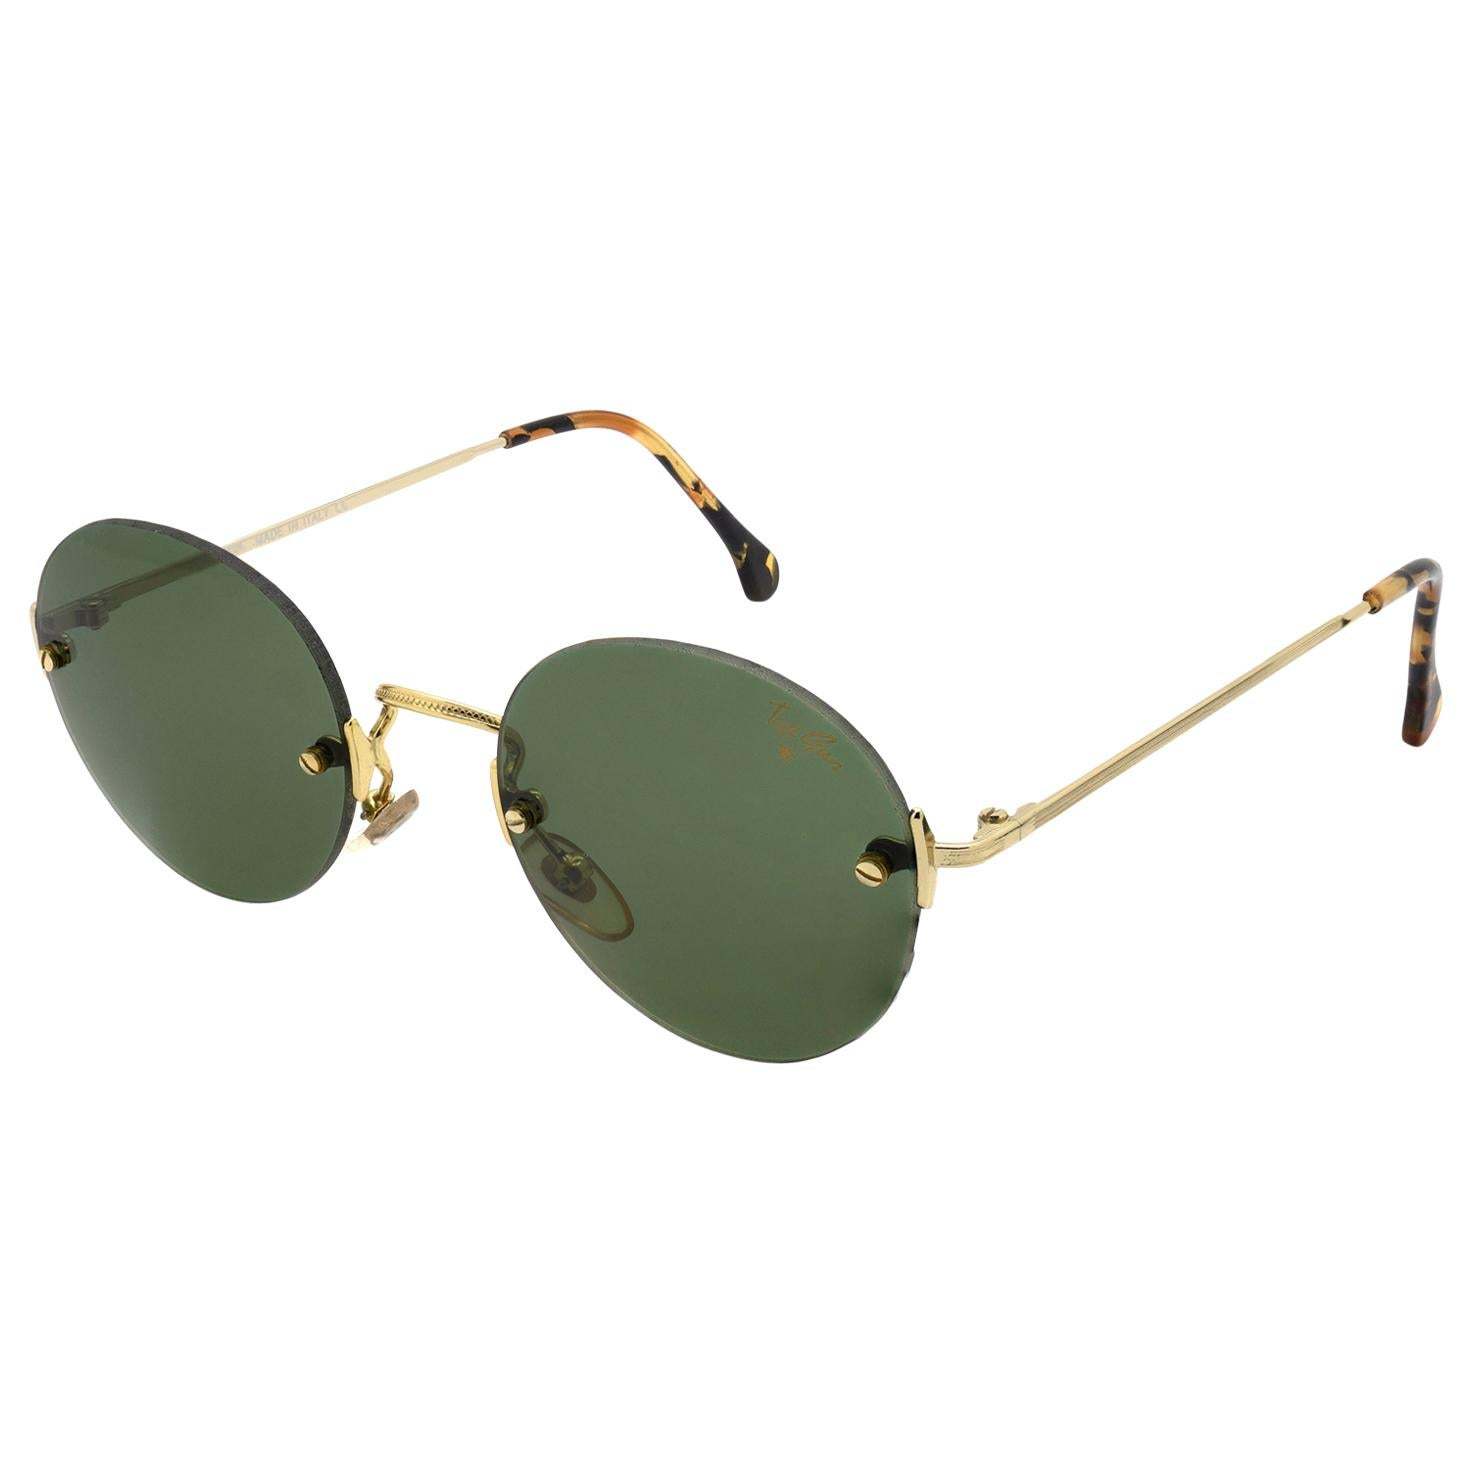 Top Gun® round rimless vintage sunglasses, Italy 90s